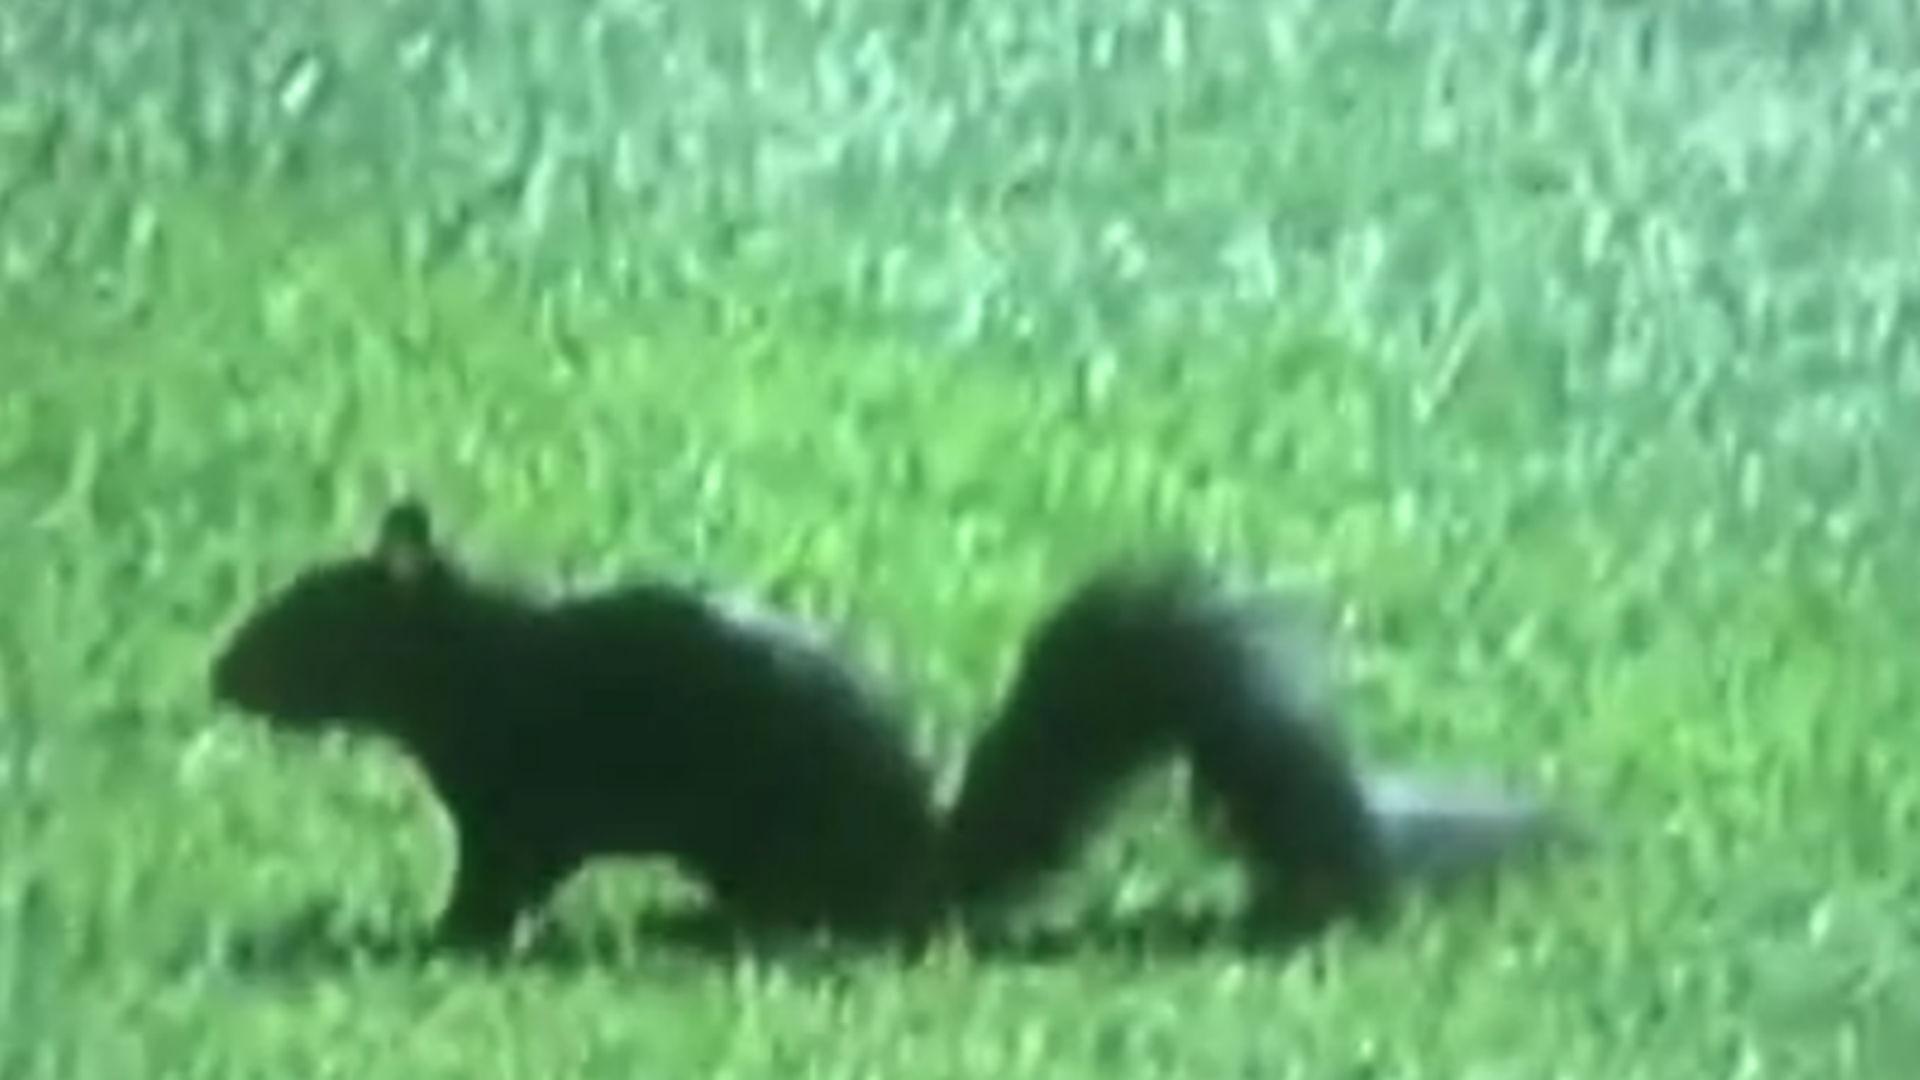 squirrel-tigers-ftr-twitter-080615